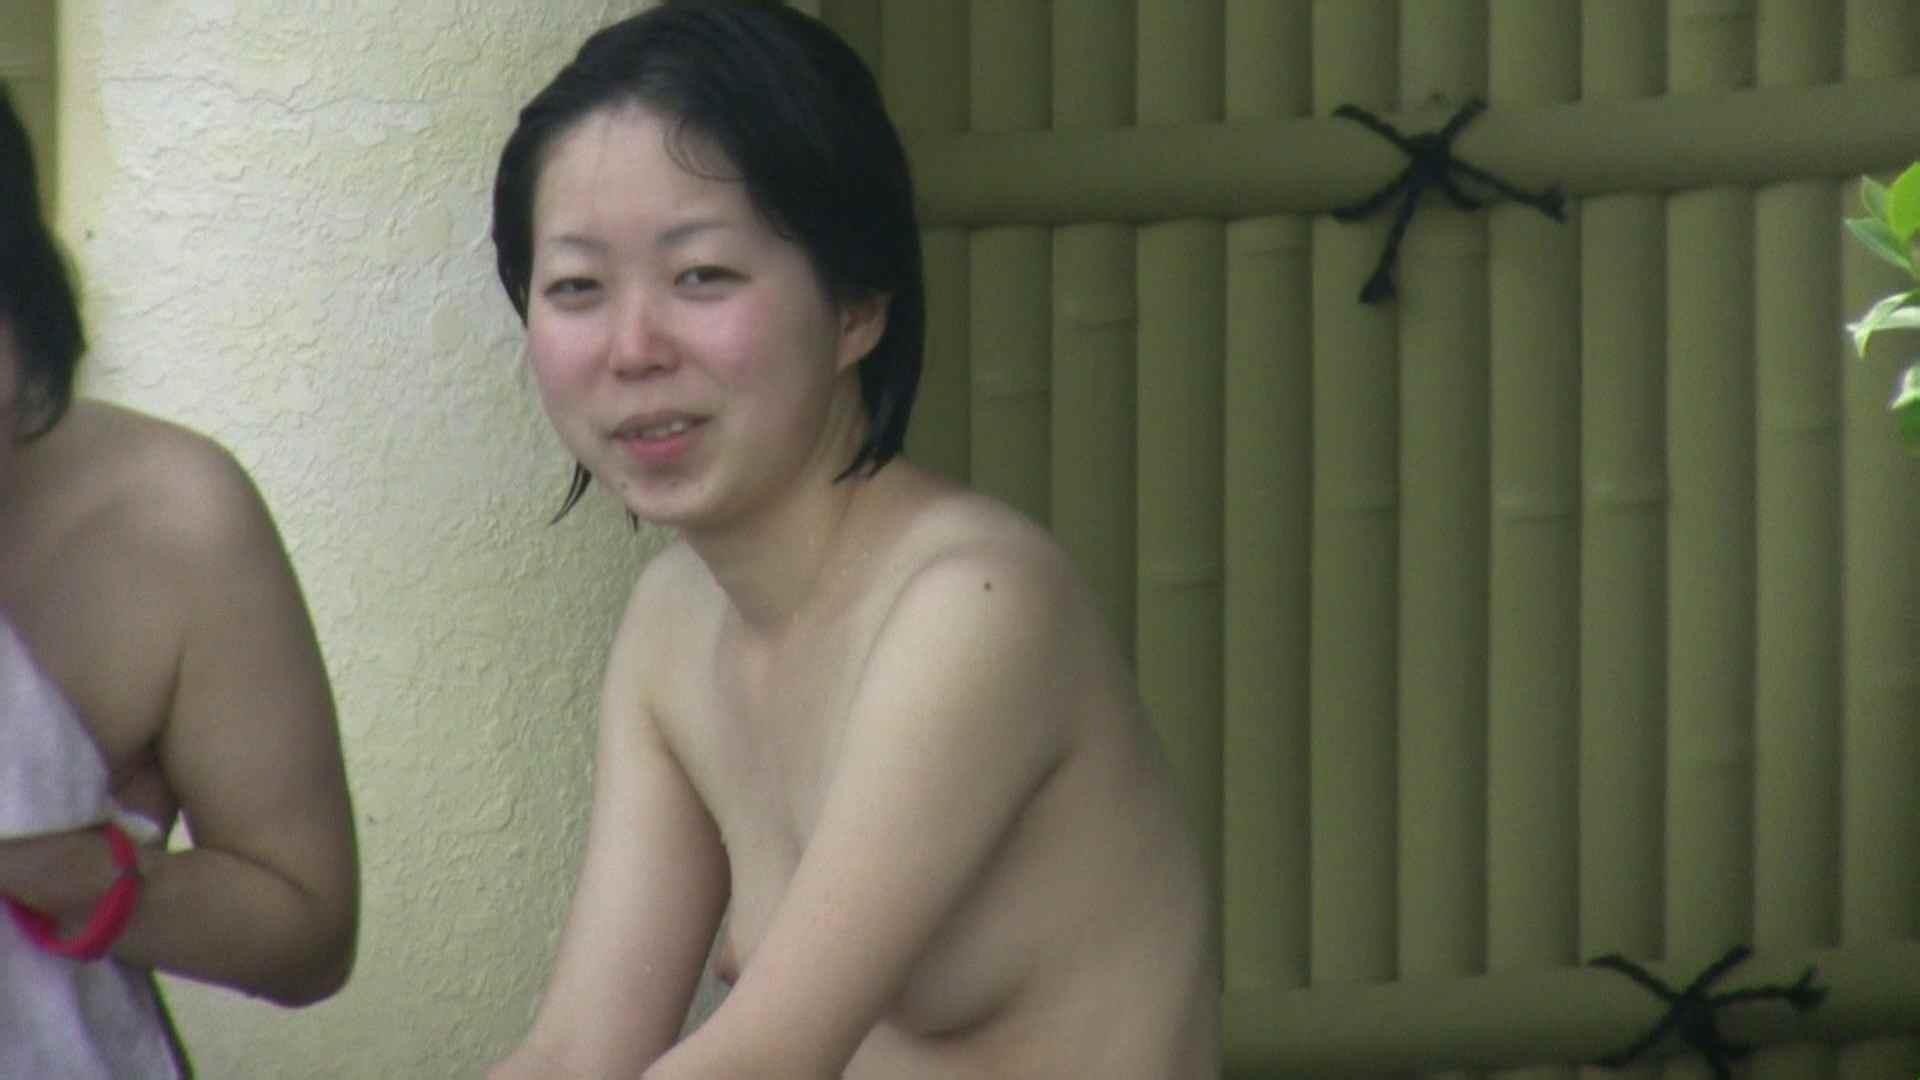 Aquaな露天風呂Vol.06【VIP】 HなOL | 盗撮  86pic 76